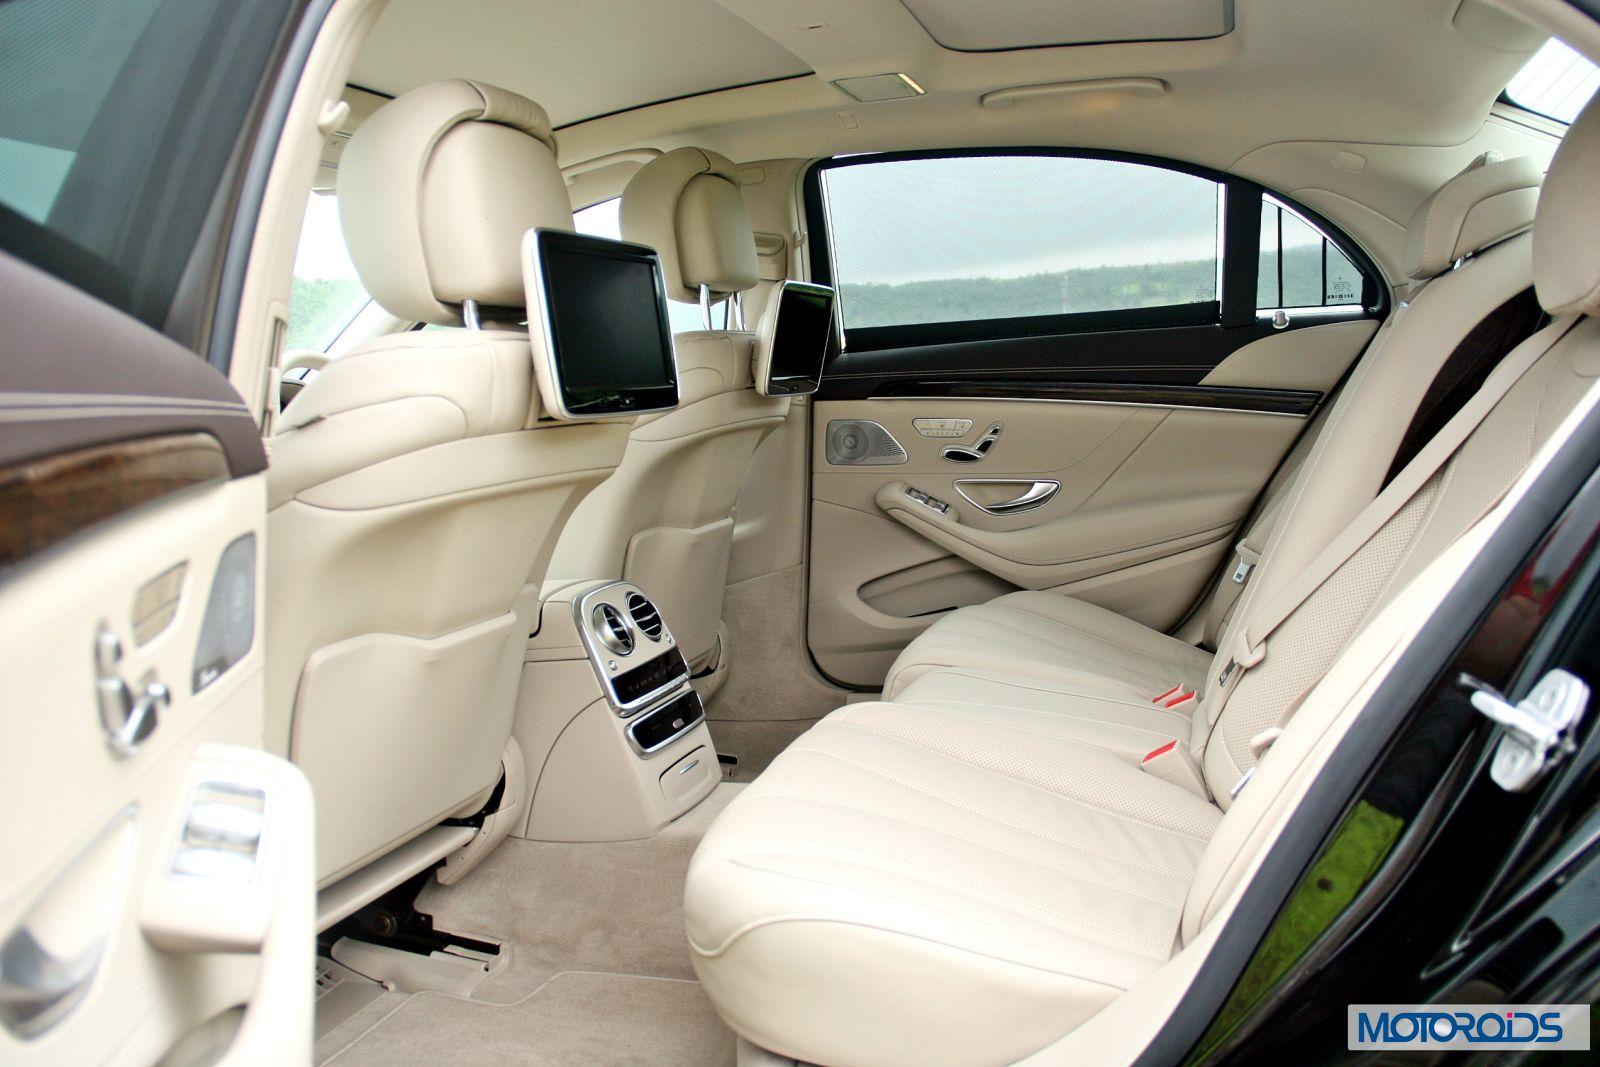 2014 mercedes s350 cdi india review sagacious splendor motoroids - 2014 mercedes c class interior ...